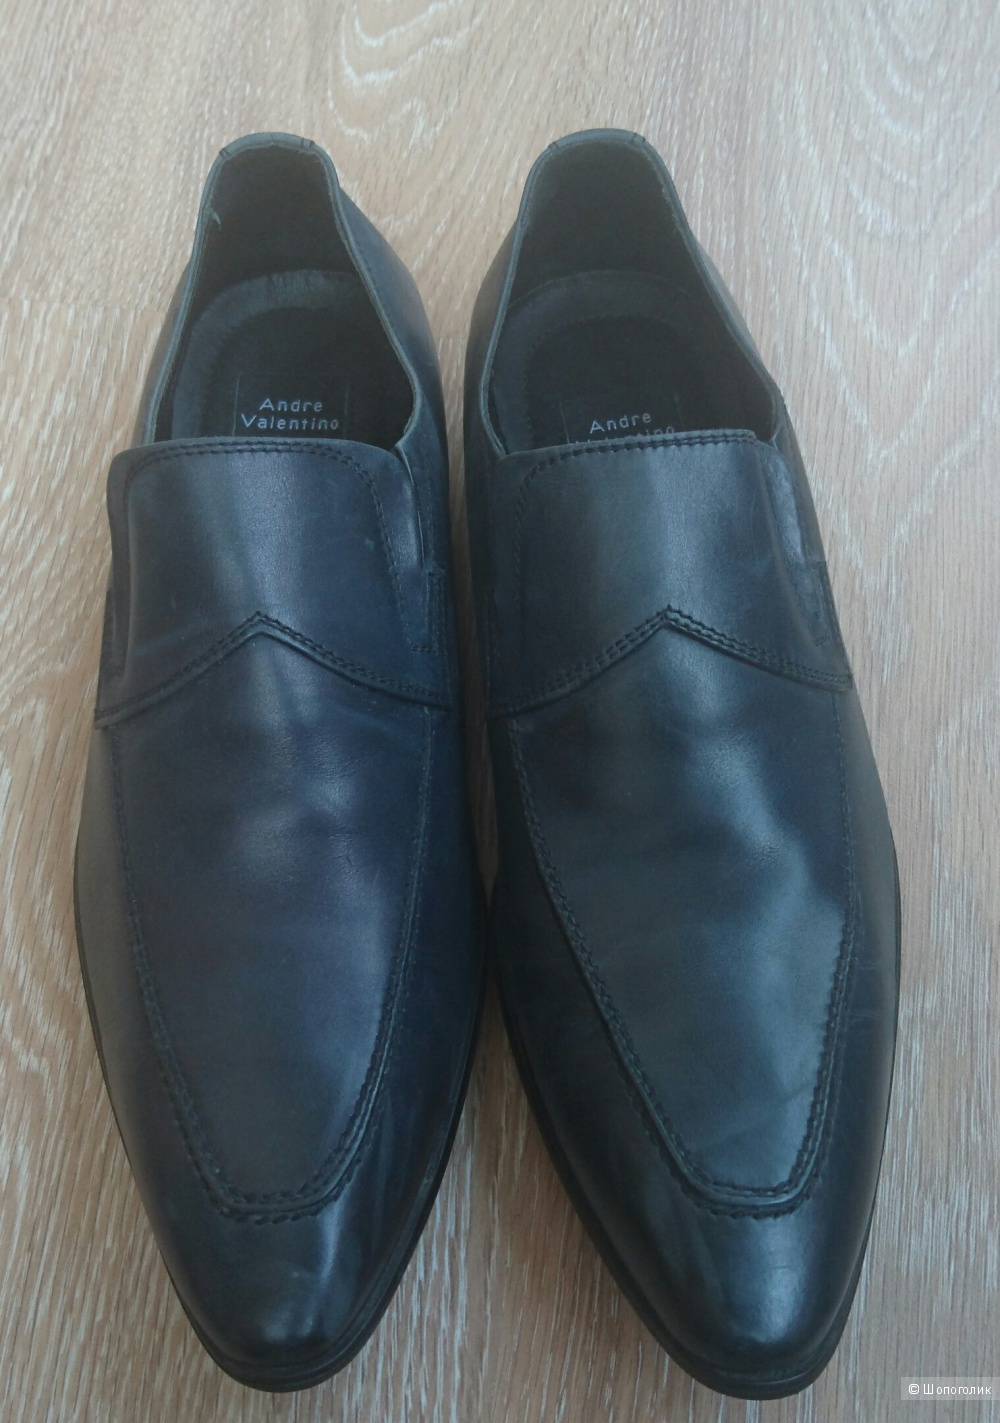 Мужские туфли Andrea Valentino 42 размер